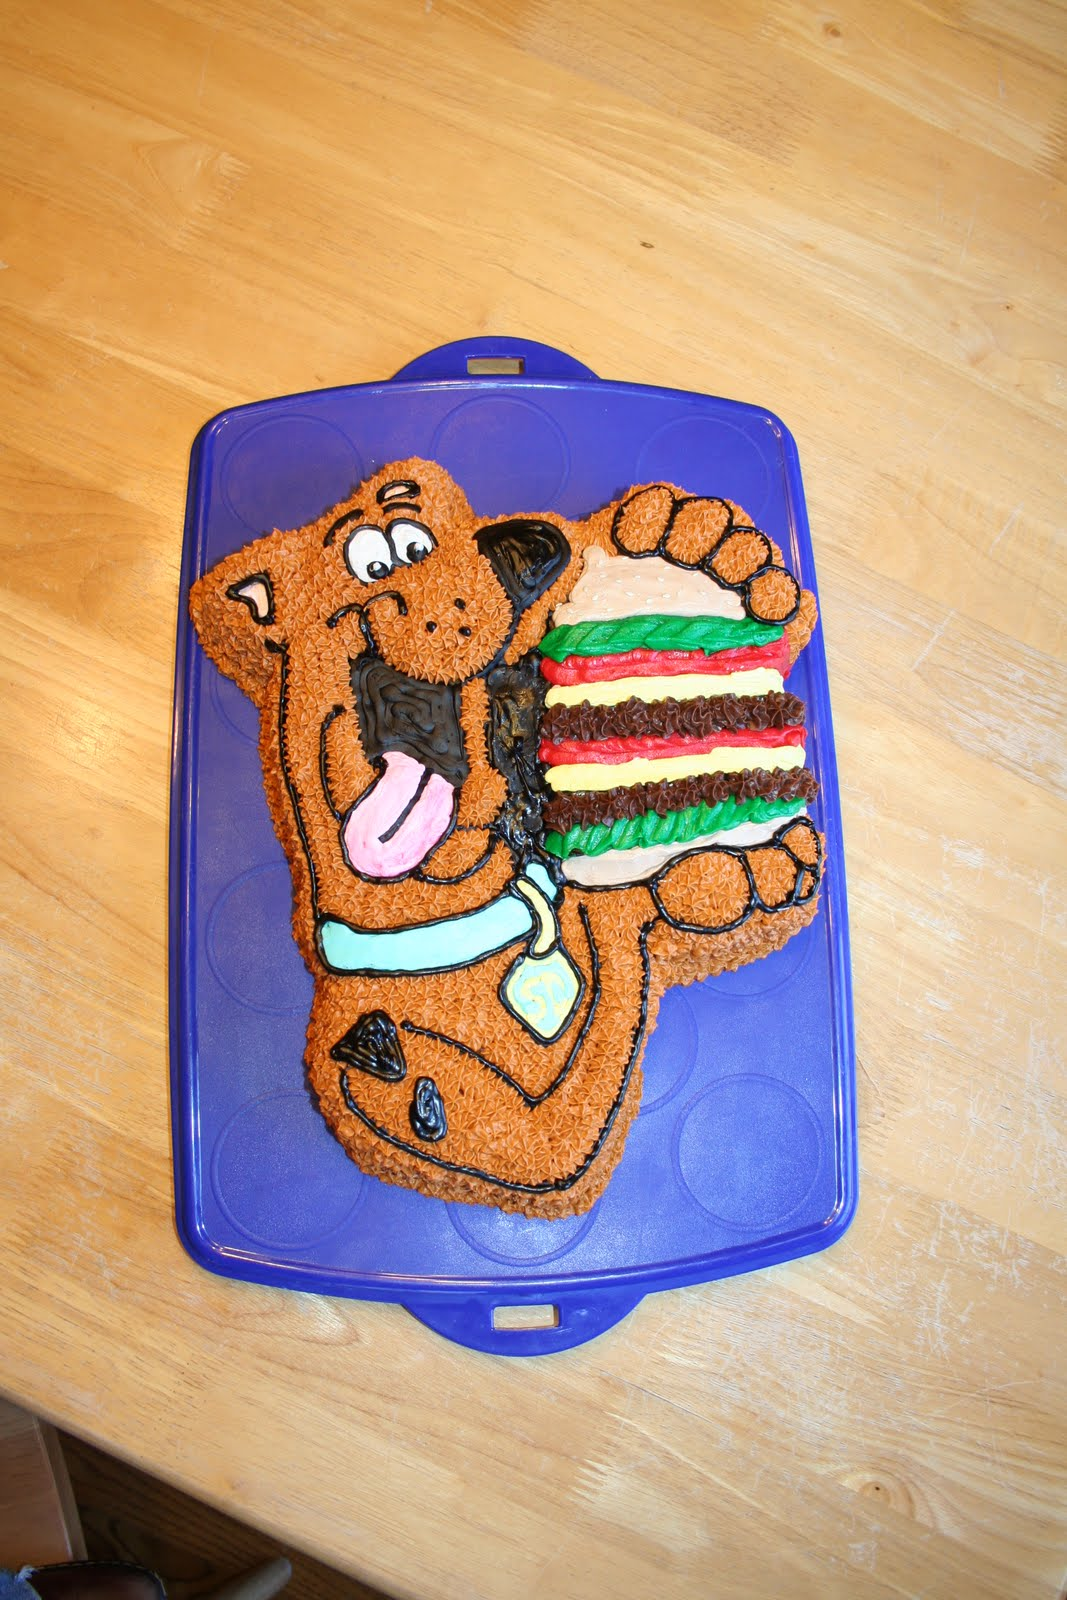 Say It Sweetly Scooby Doo Cake 02 20 2010